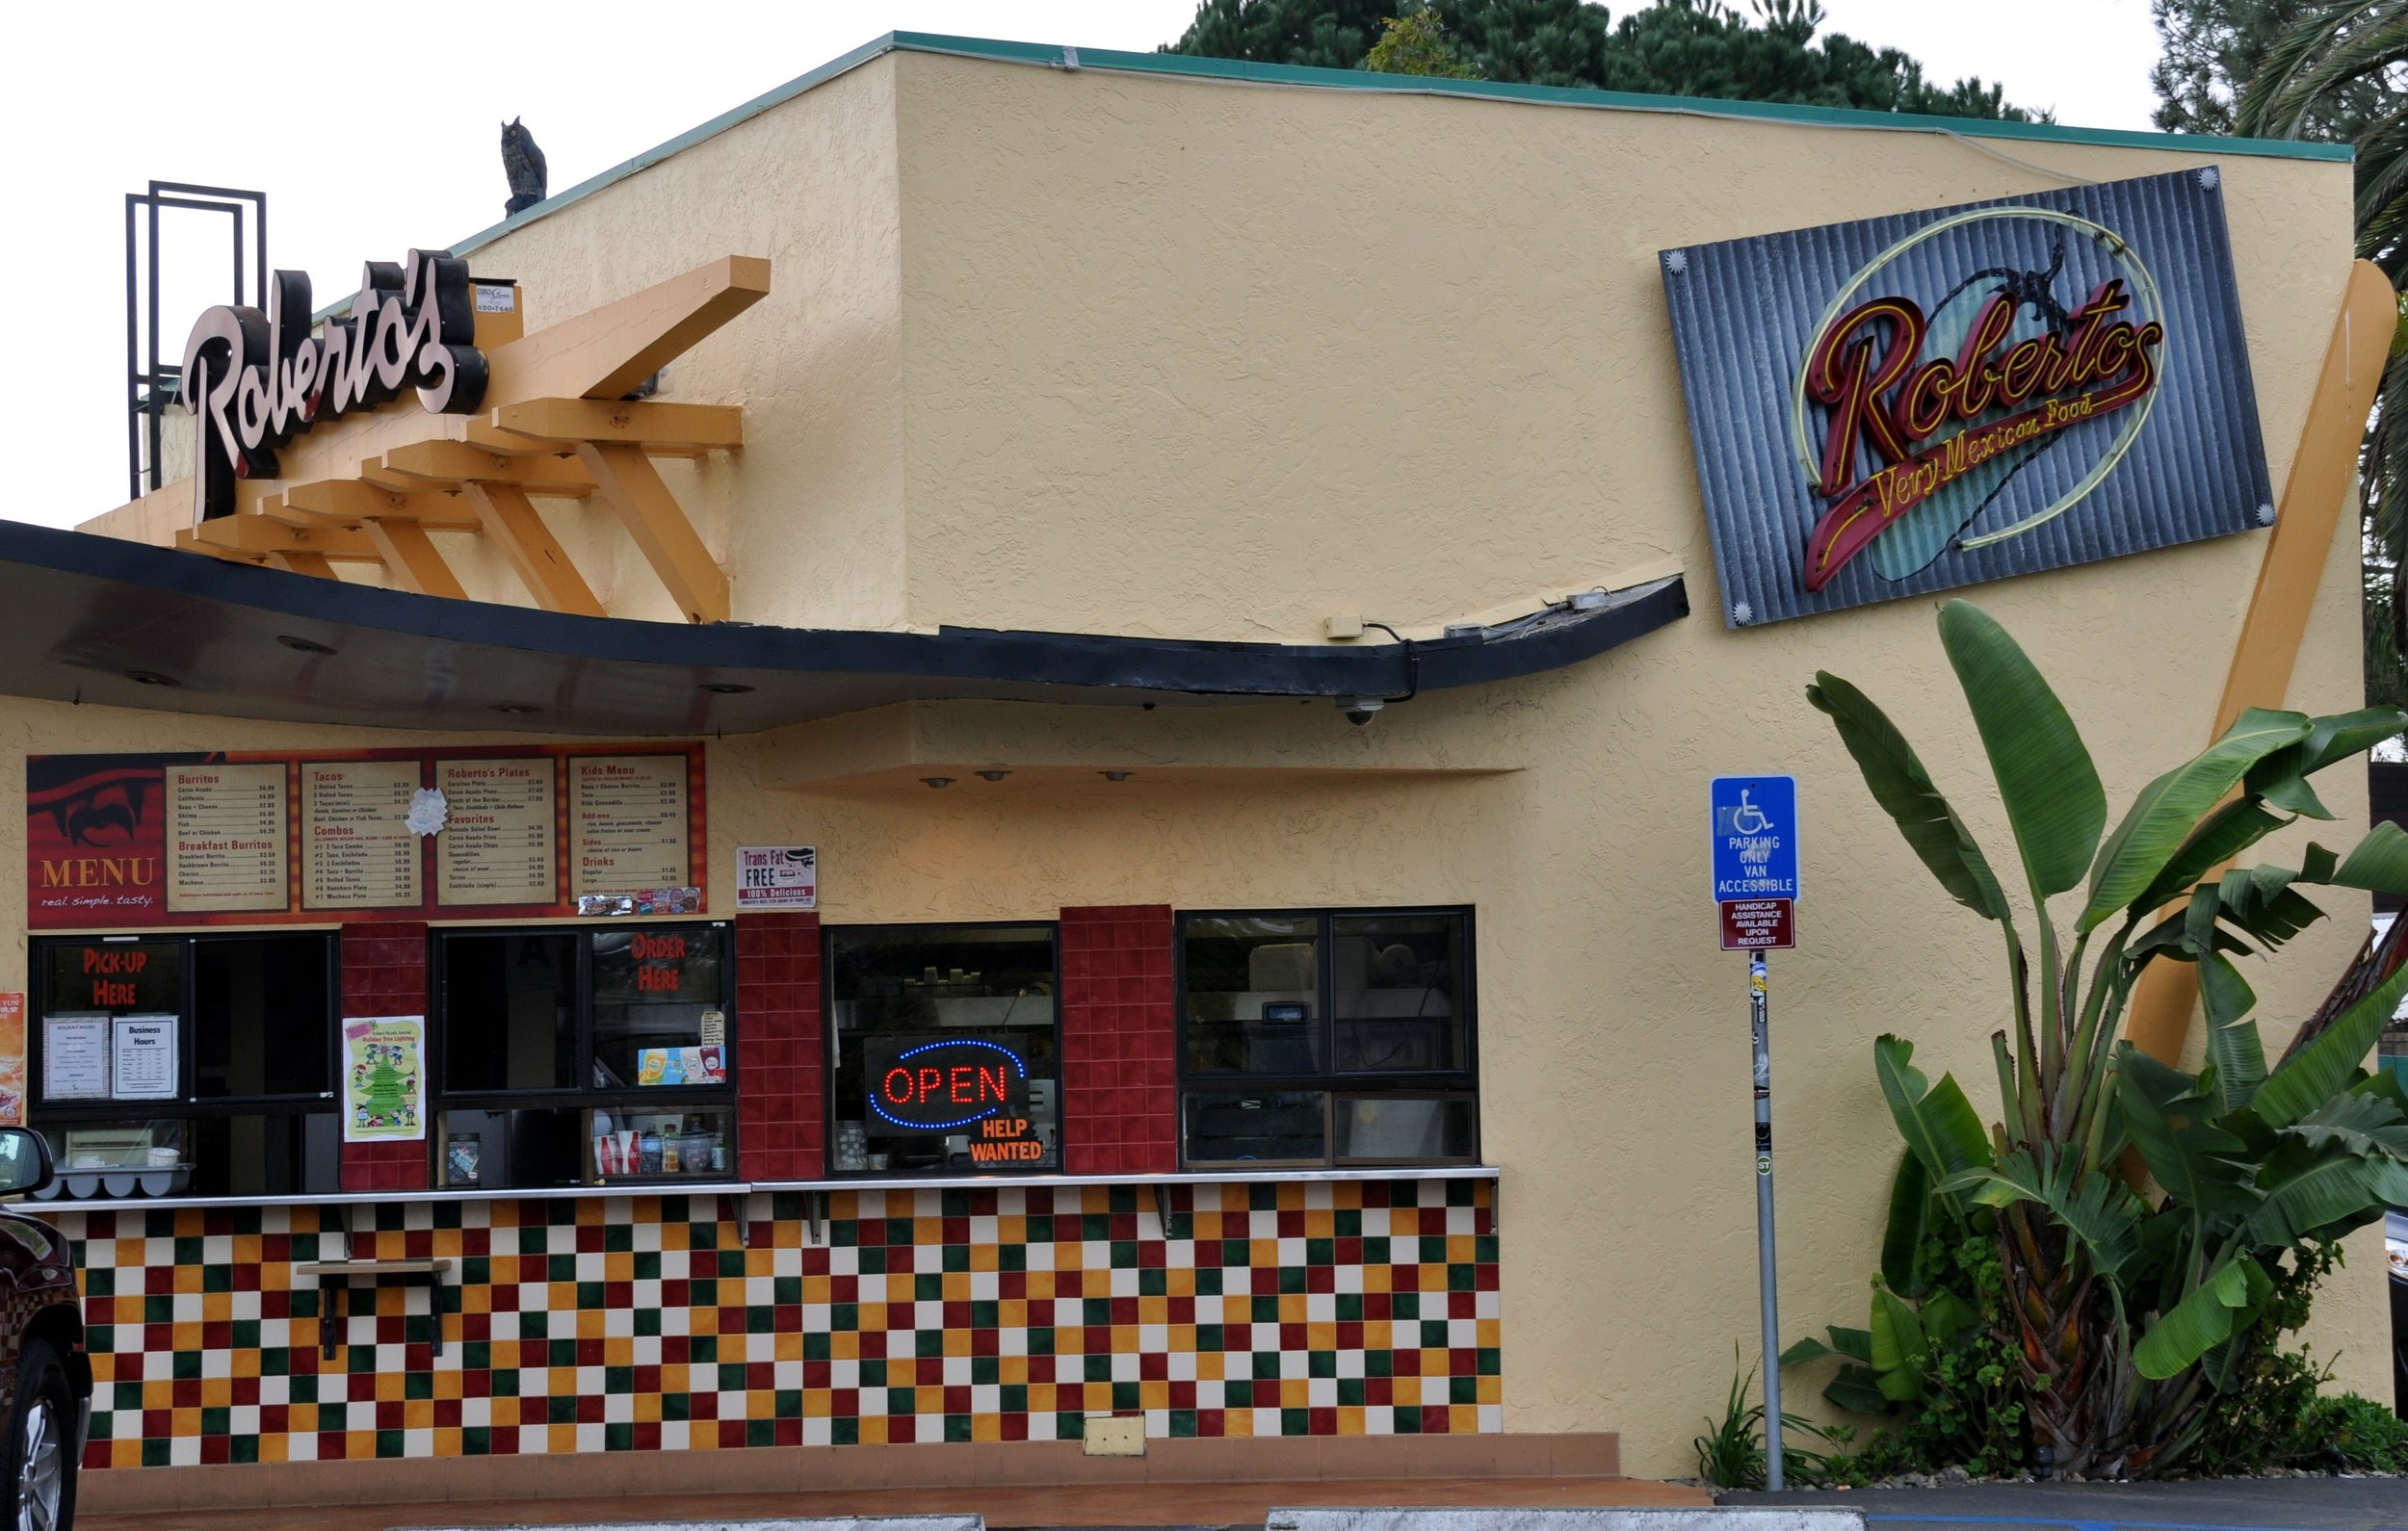 Roberto's - Low-key fast-food taco shopRecs: Machaca Burrito, Cheese Quesadilla and any lunch burrito